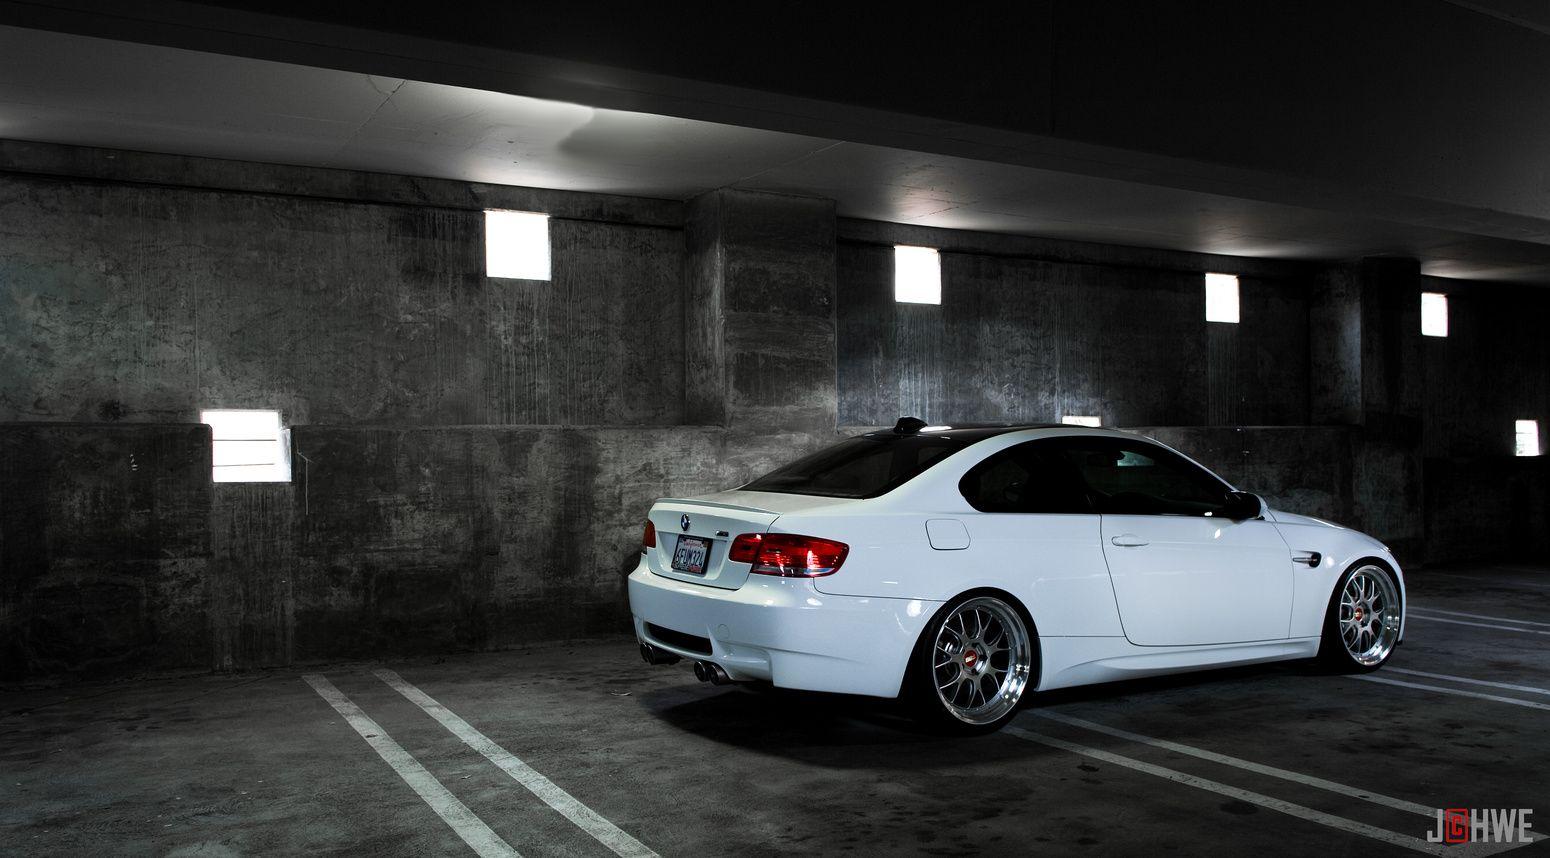 Matte Black Luxury Car Wallpaper Alpine White E92 M3 On 20 Quot Bbs Lm R Das Auto Bmw